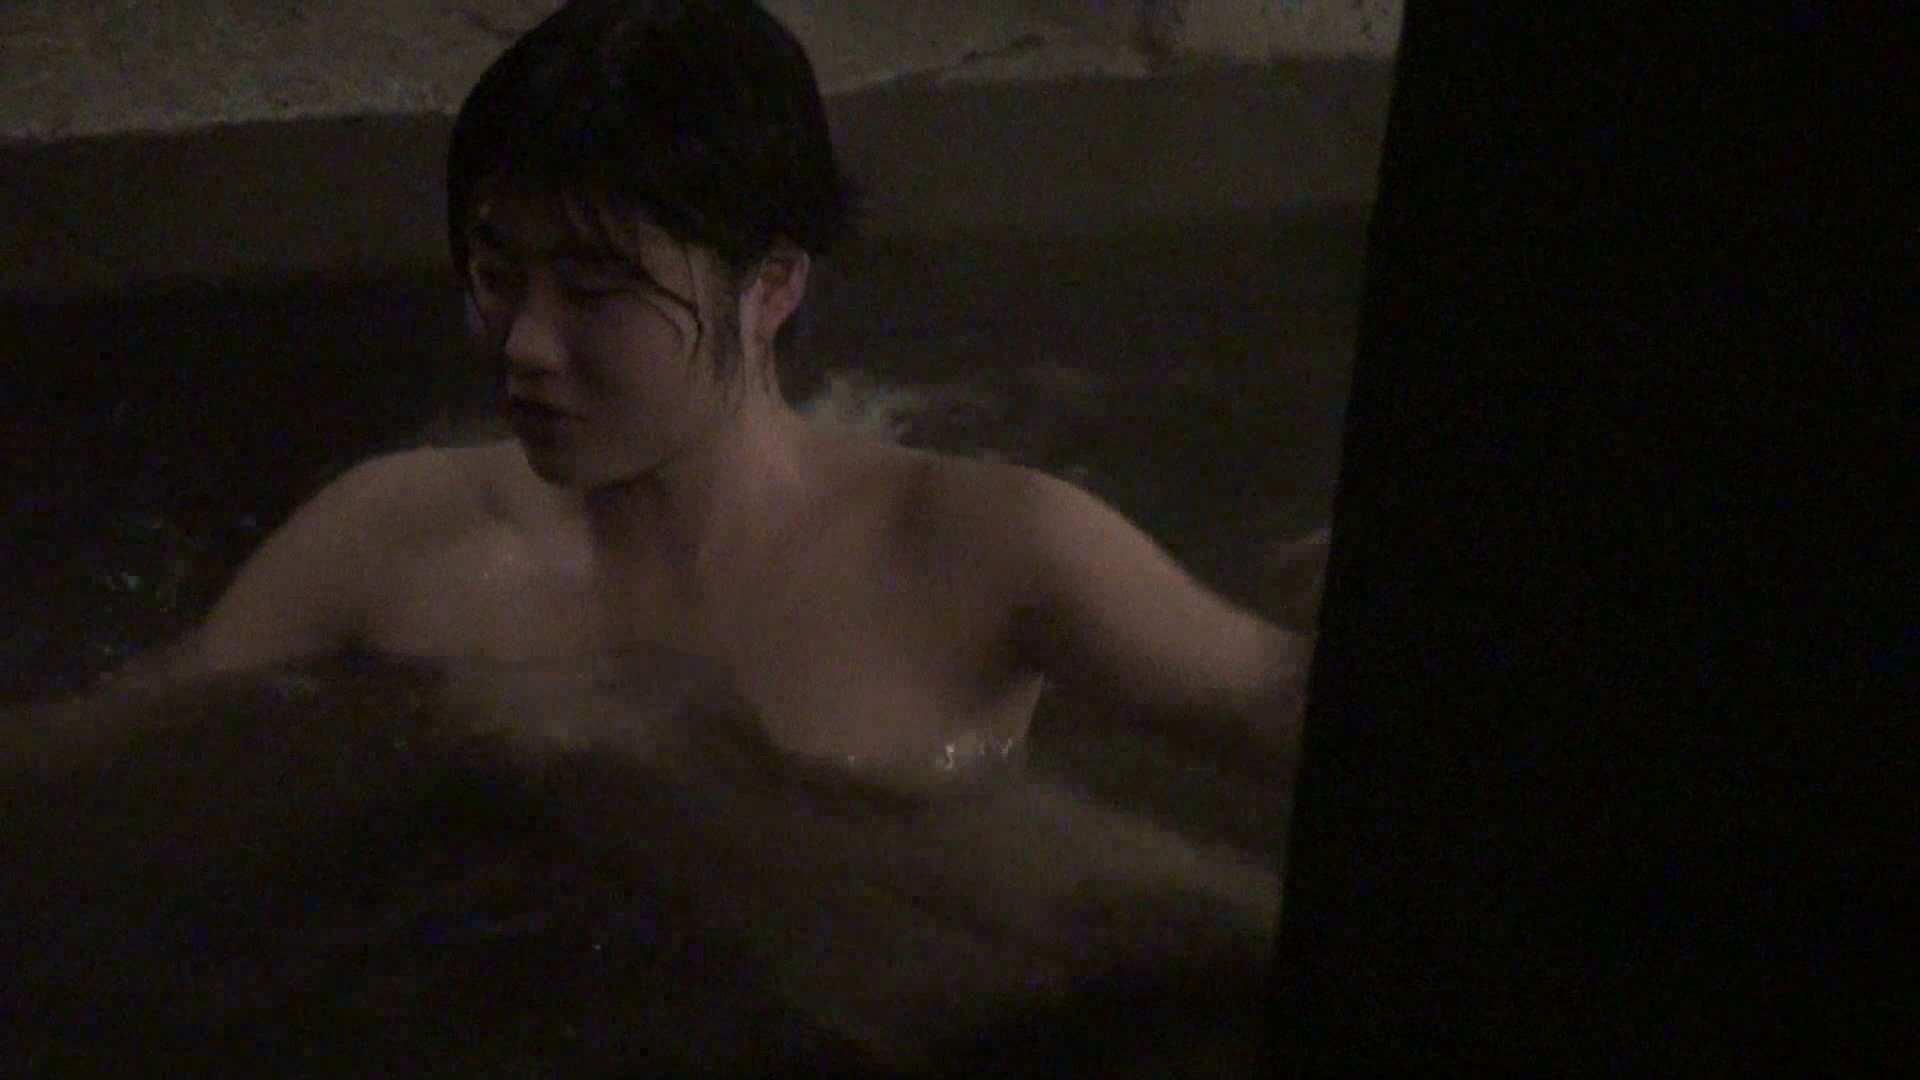 Aquaな露天風呂Vol.343 0  83連発 58